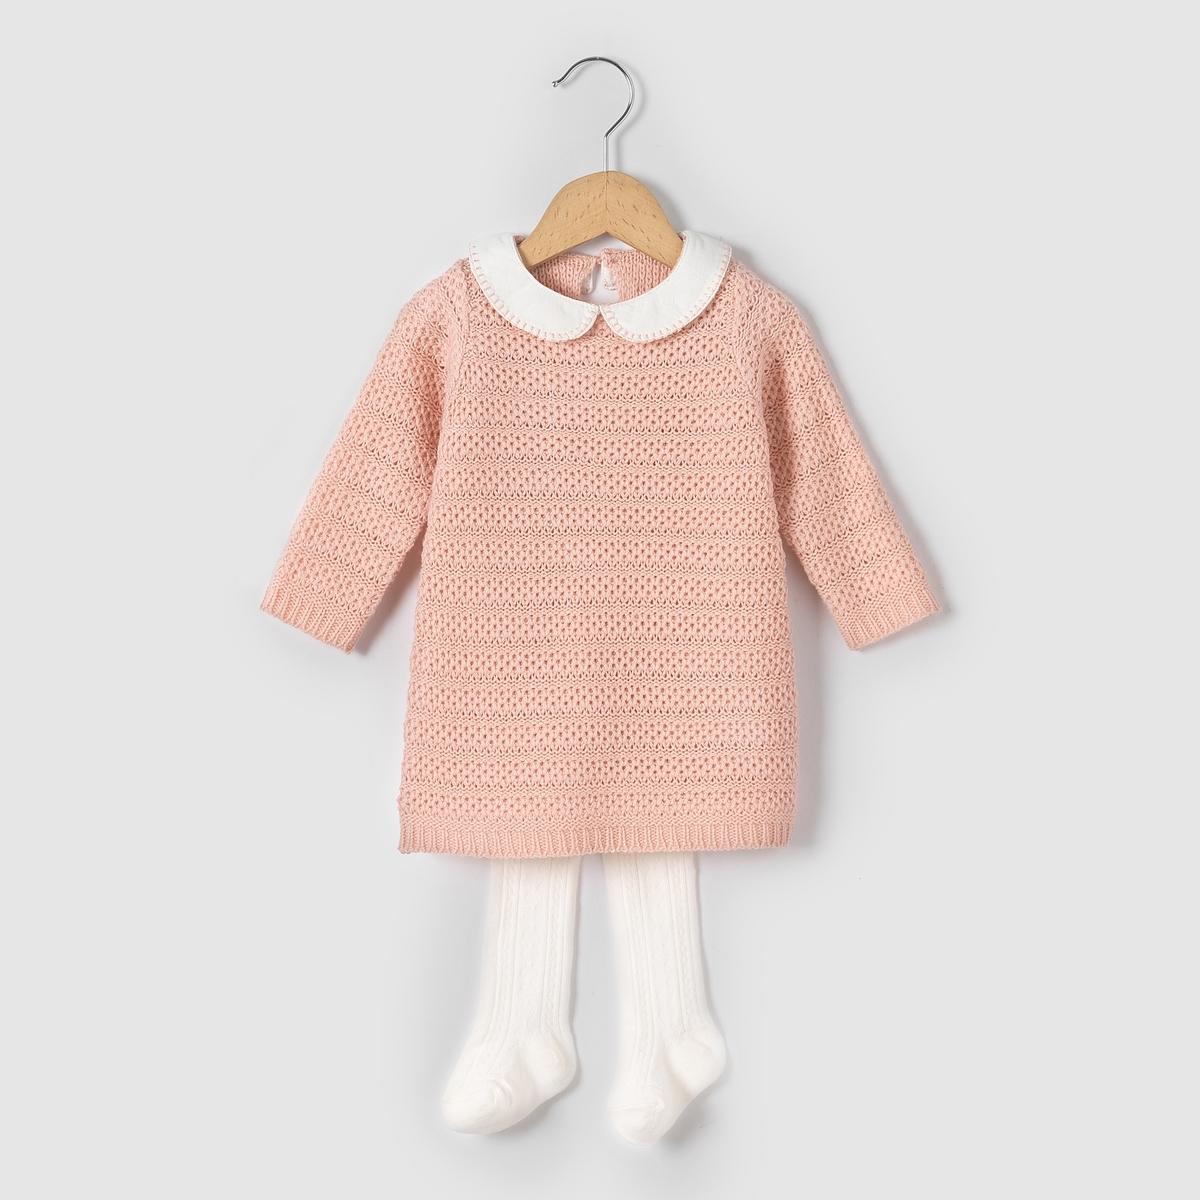 Комплект из платья и колготок, возраст 1 мес. - 3 года от La Redoute Collections